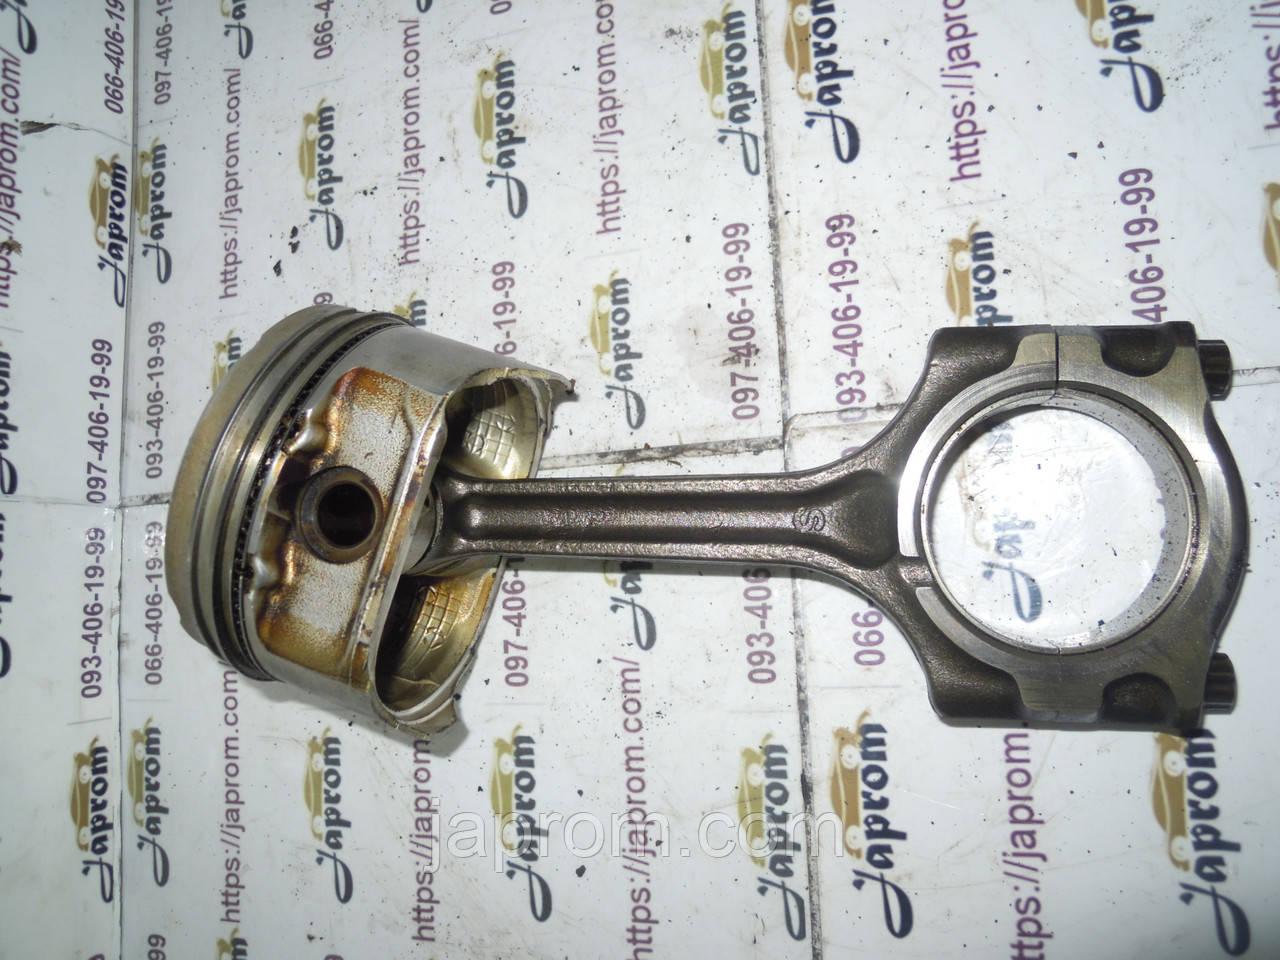 Поршень с шатуном (комплект) Mazda 3 323 BJ 626 GF MPV Premacy 1997-2002г.в. 2.0 бензин